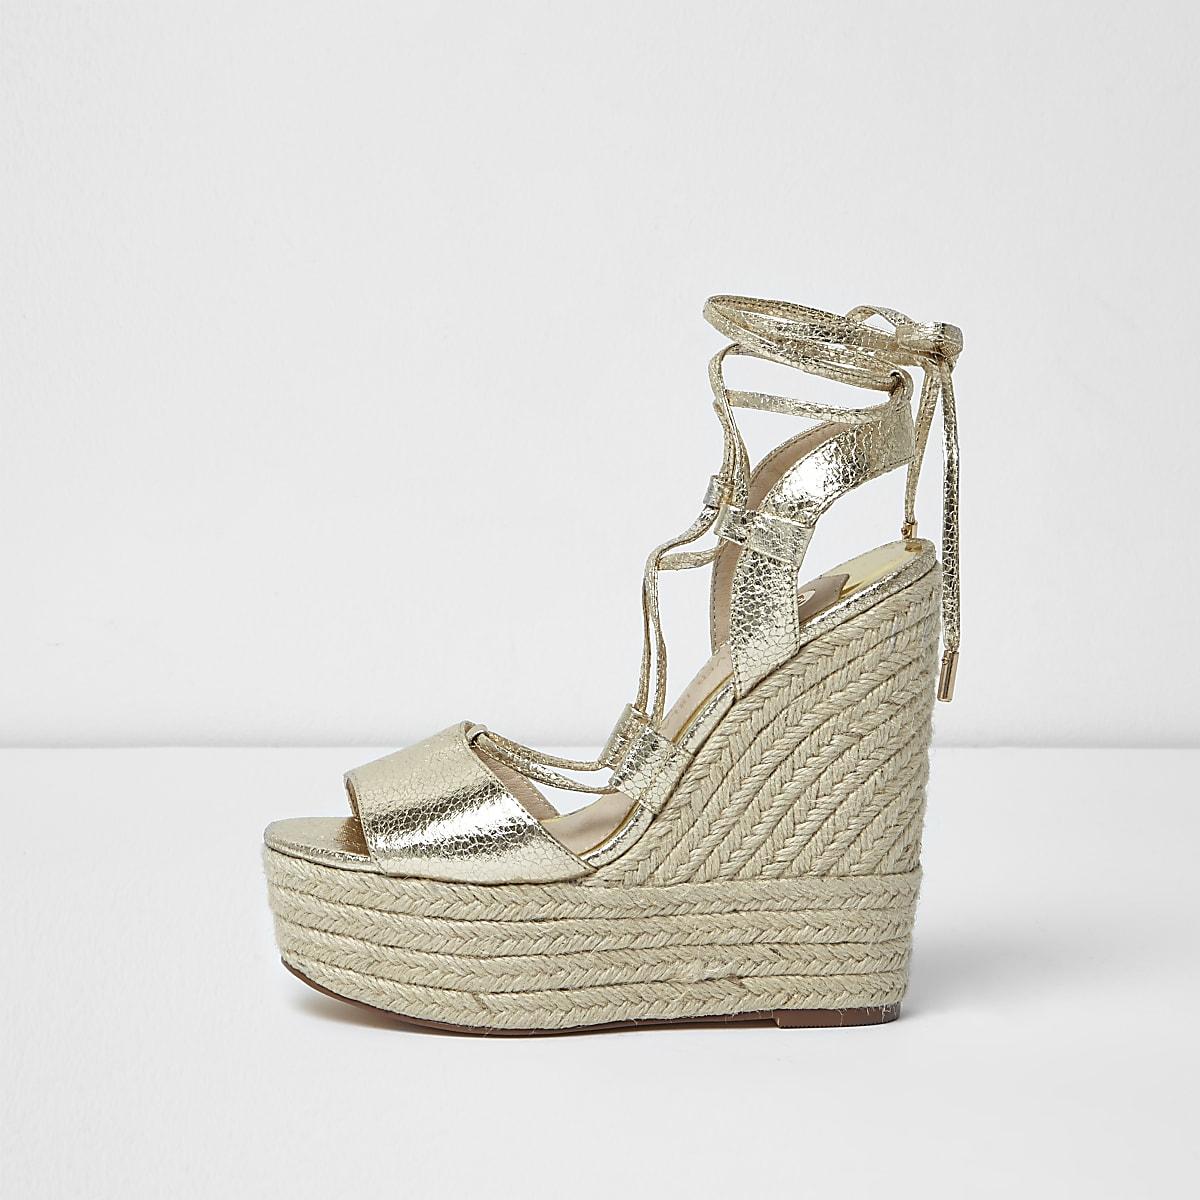 6eebae19b4 Gold tie up espadrille platform wedges - Sandals - Shoes & Boots - women